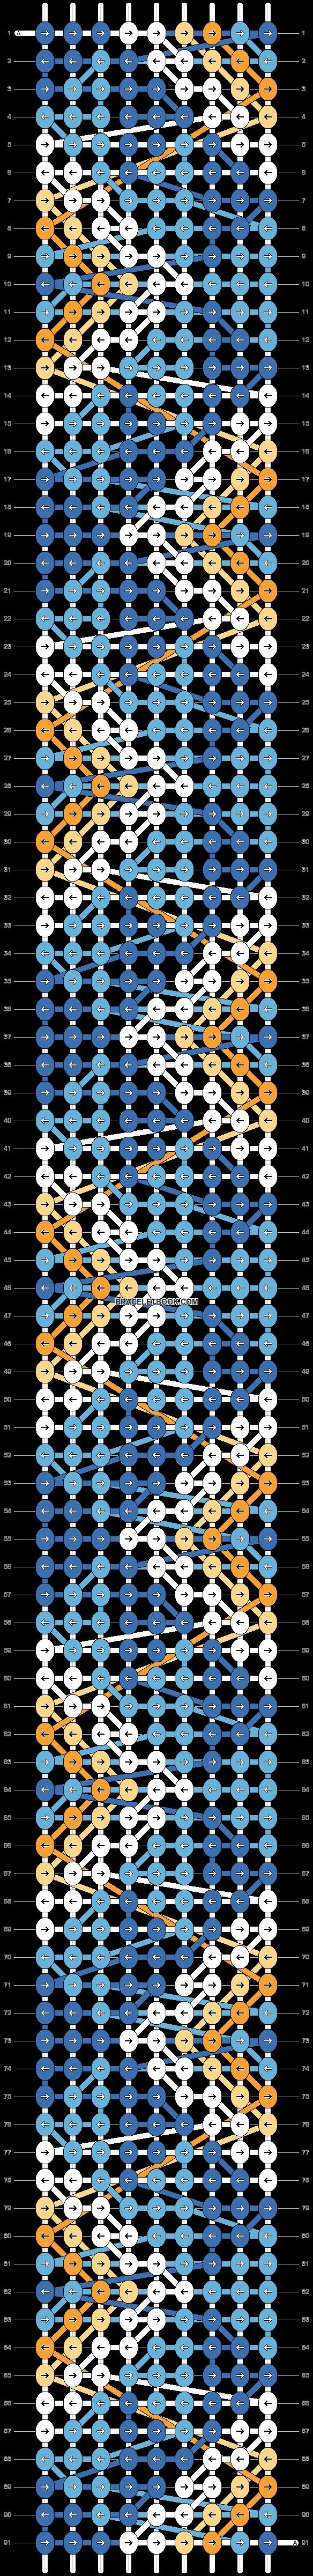 Alpha pattern #25312 pattern